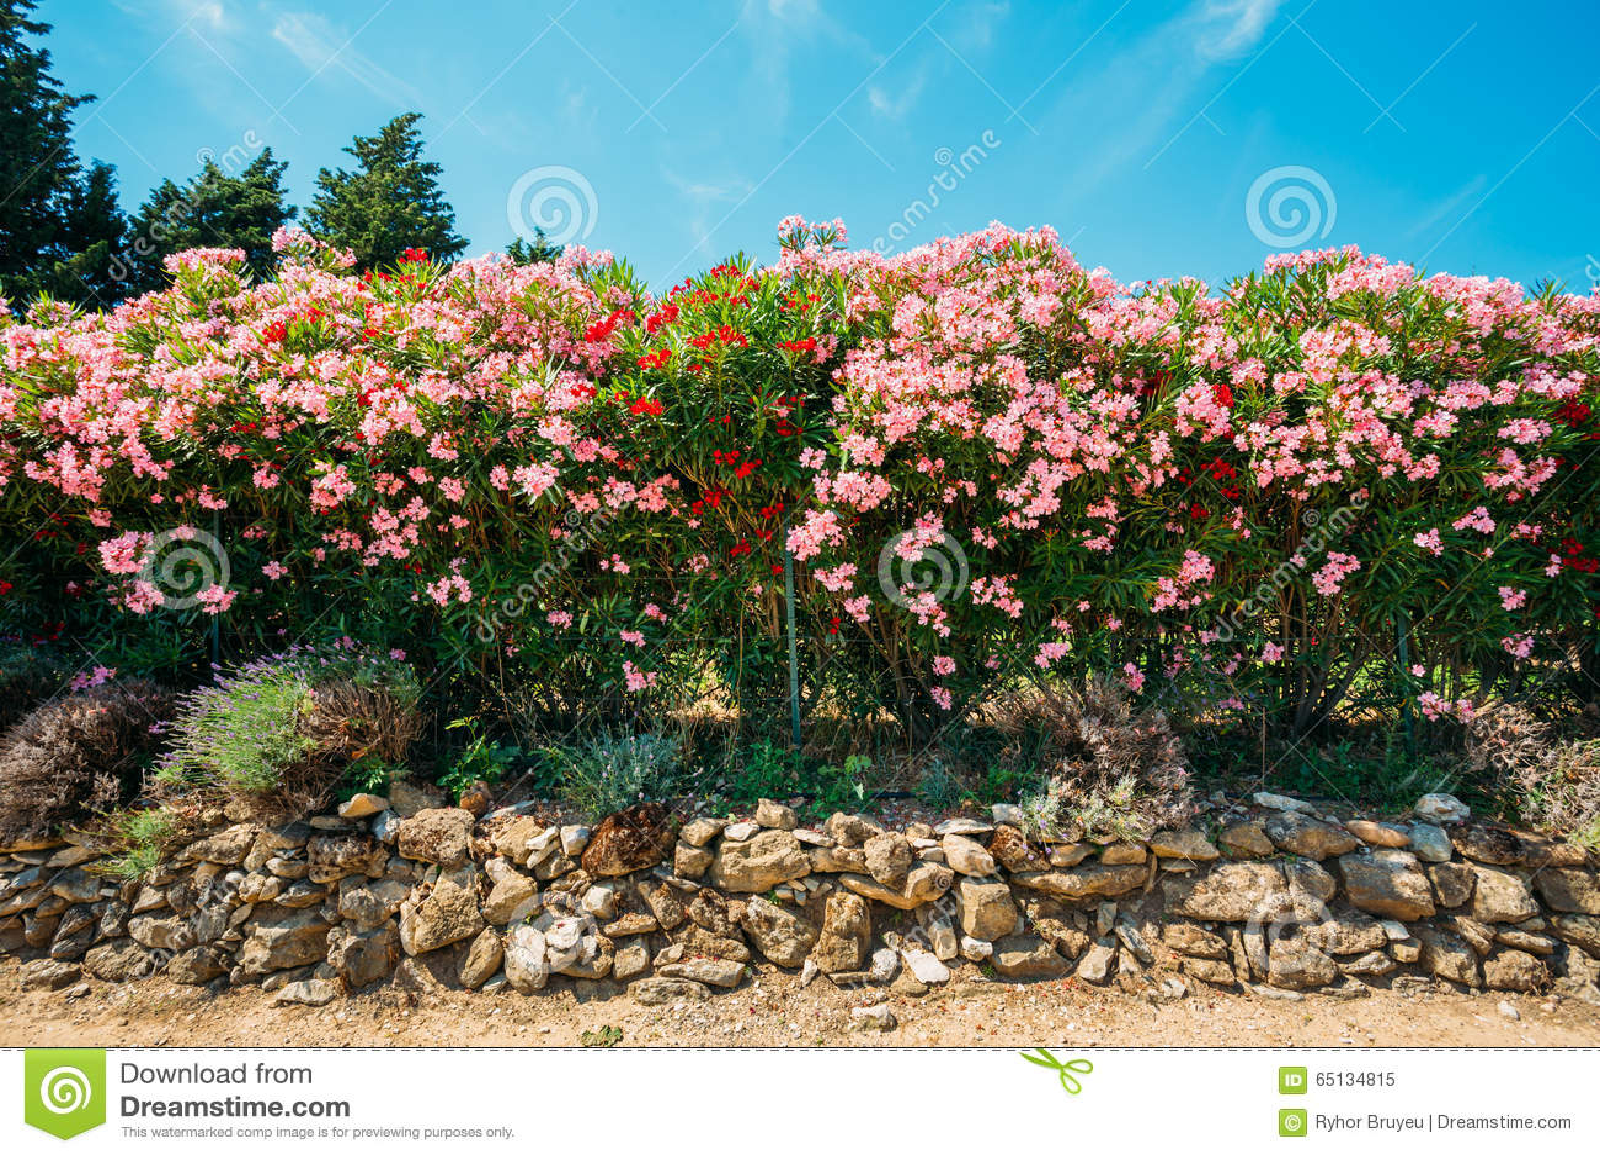 Hedge Of Flowering Shrubs. Pink Flowers. Garden Stock Image - Image ...